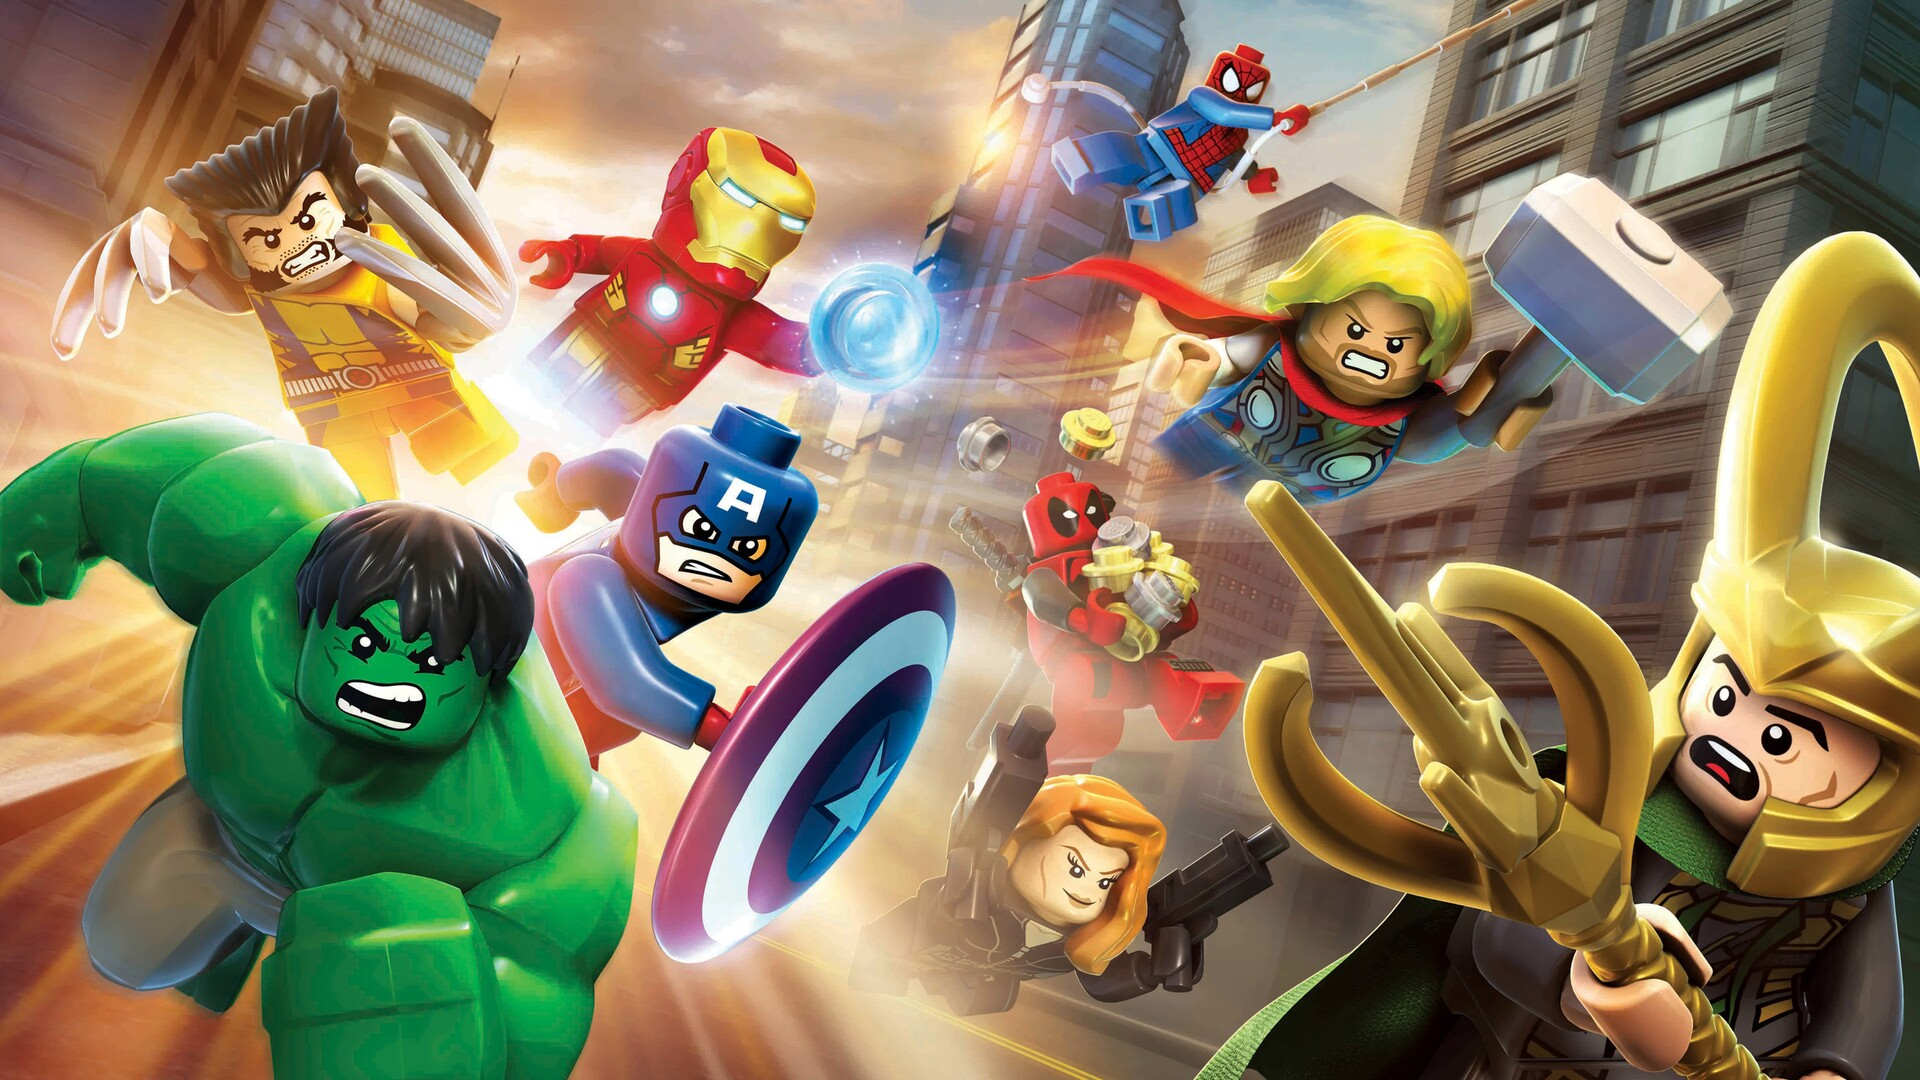 1920x1080 Marvel Lego Superheroes Laptop Full Hd 1080p Hd 4k